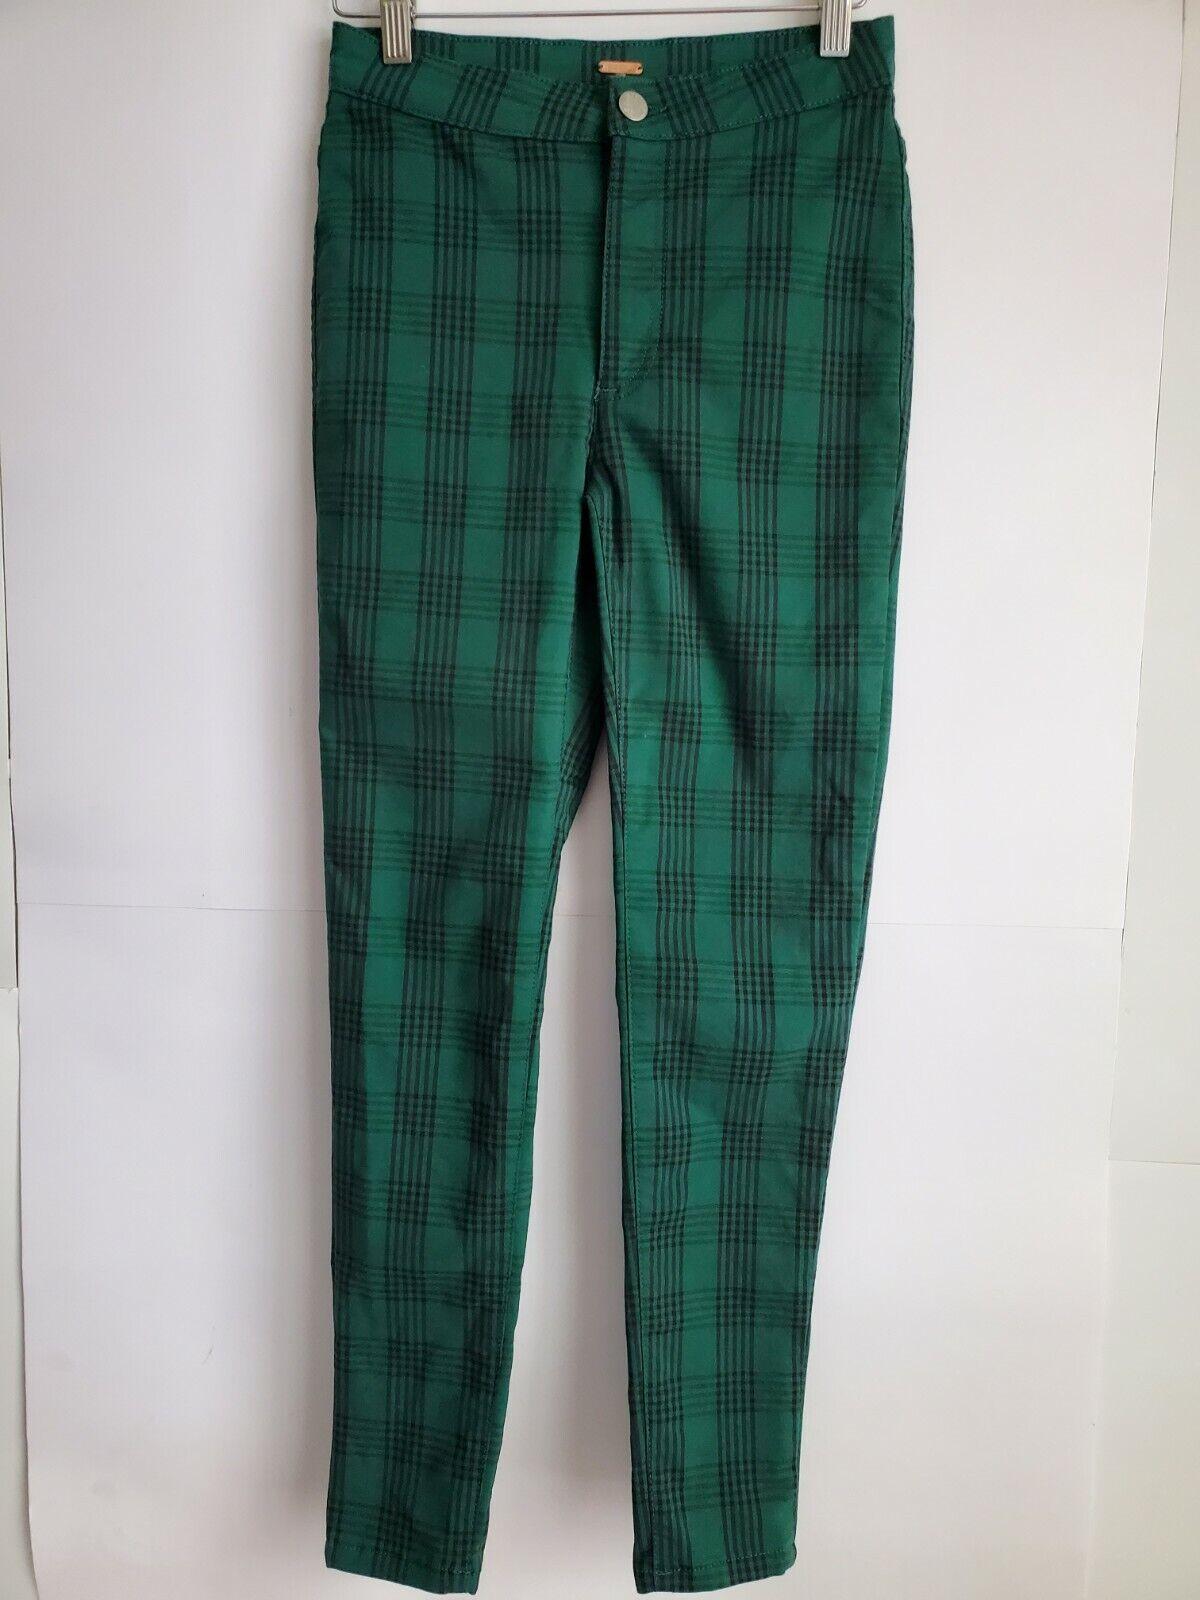 Free People  Women's Green Plaid Skinny Pants, Si… - image 4